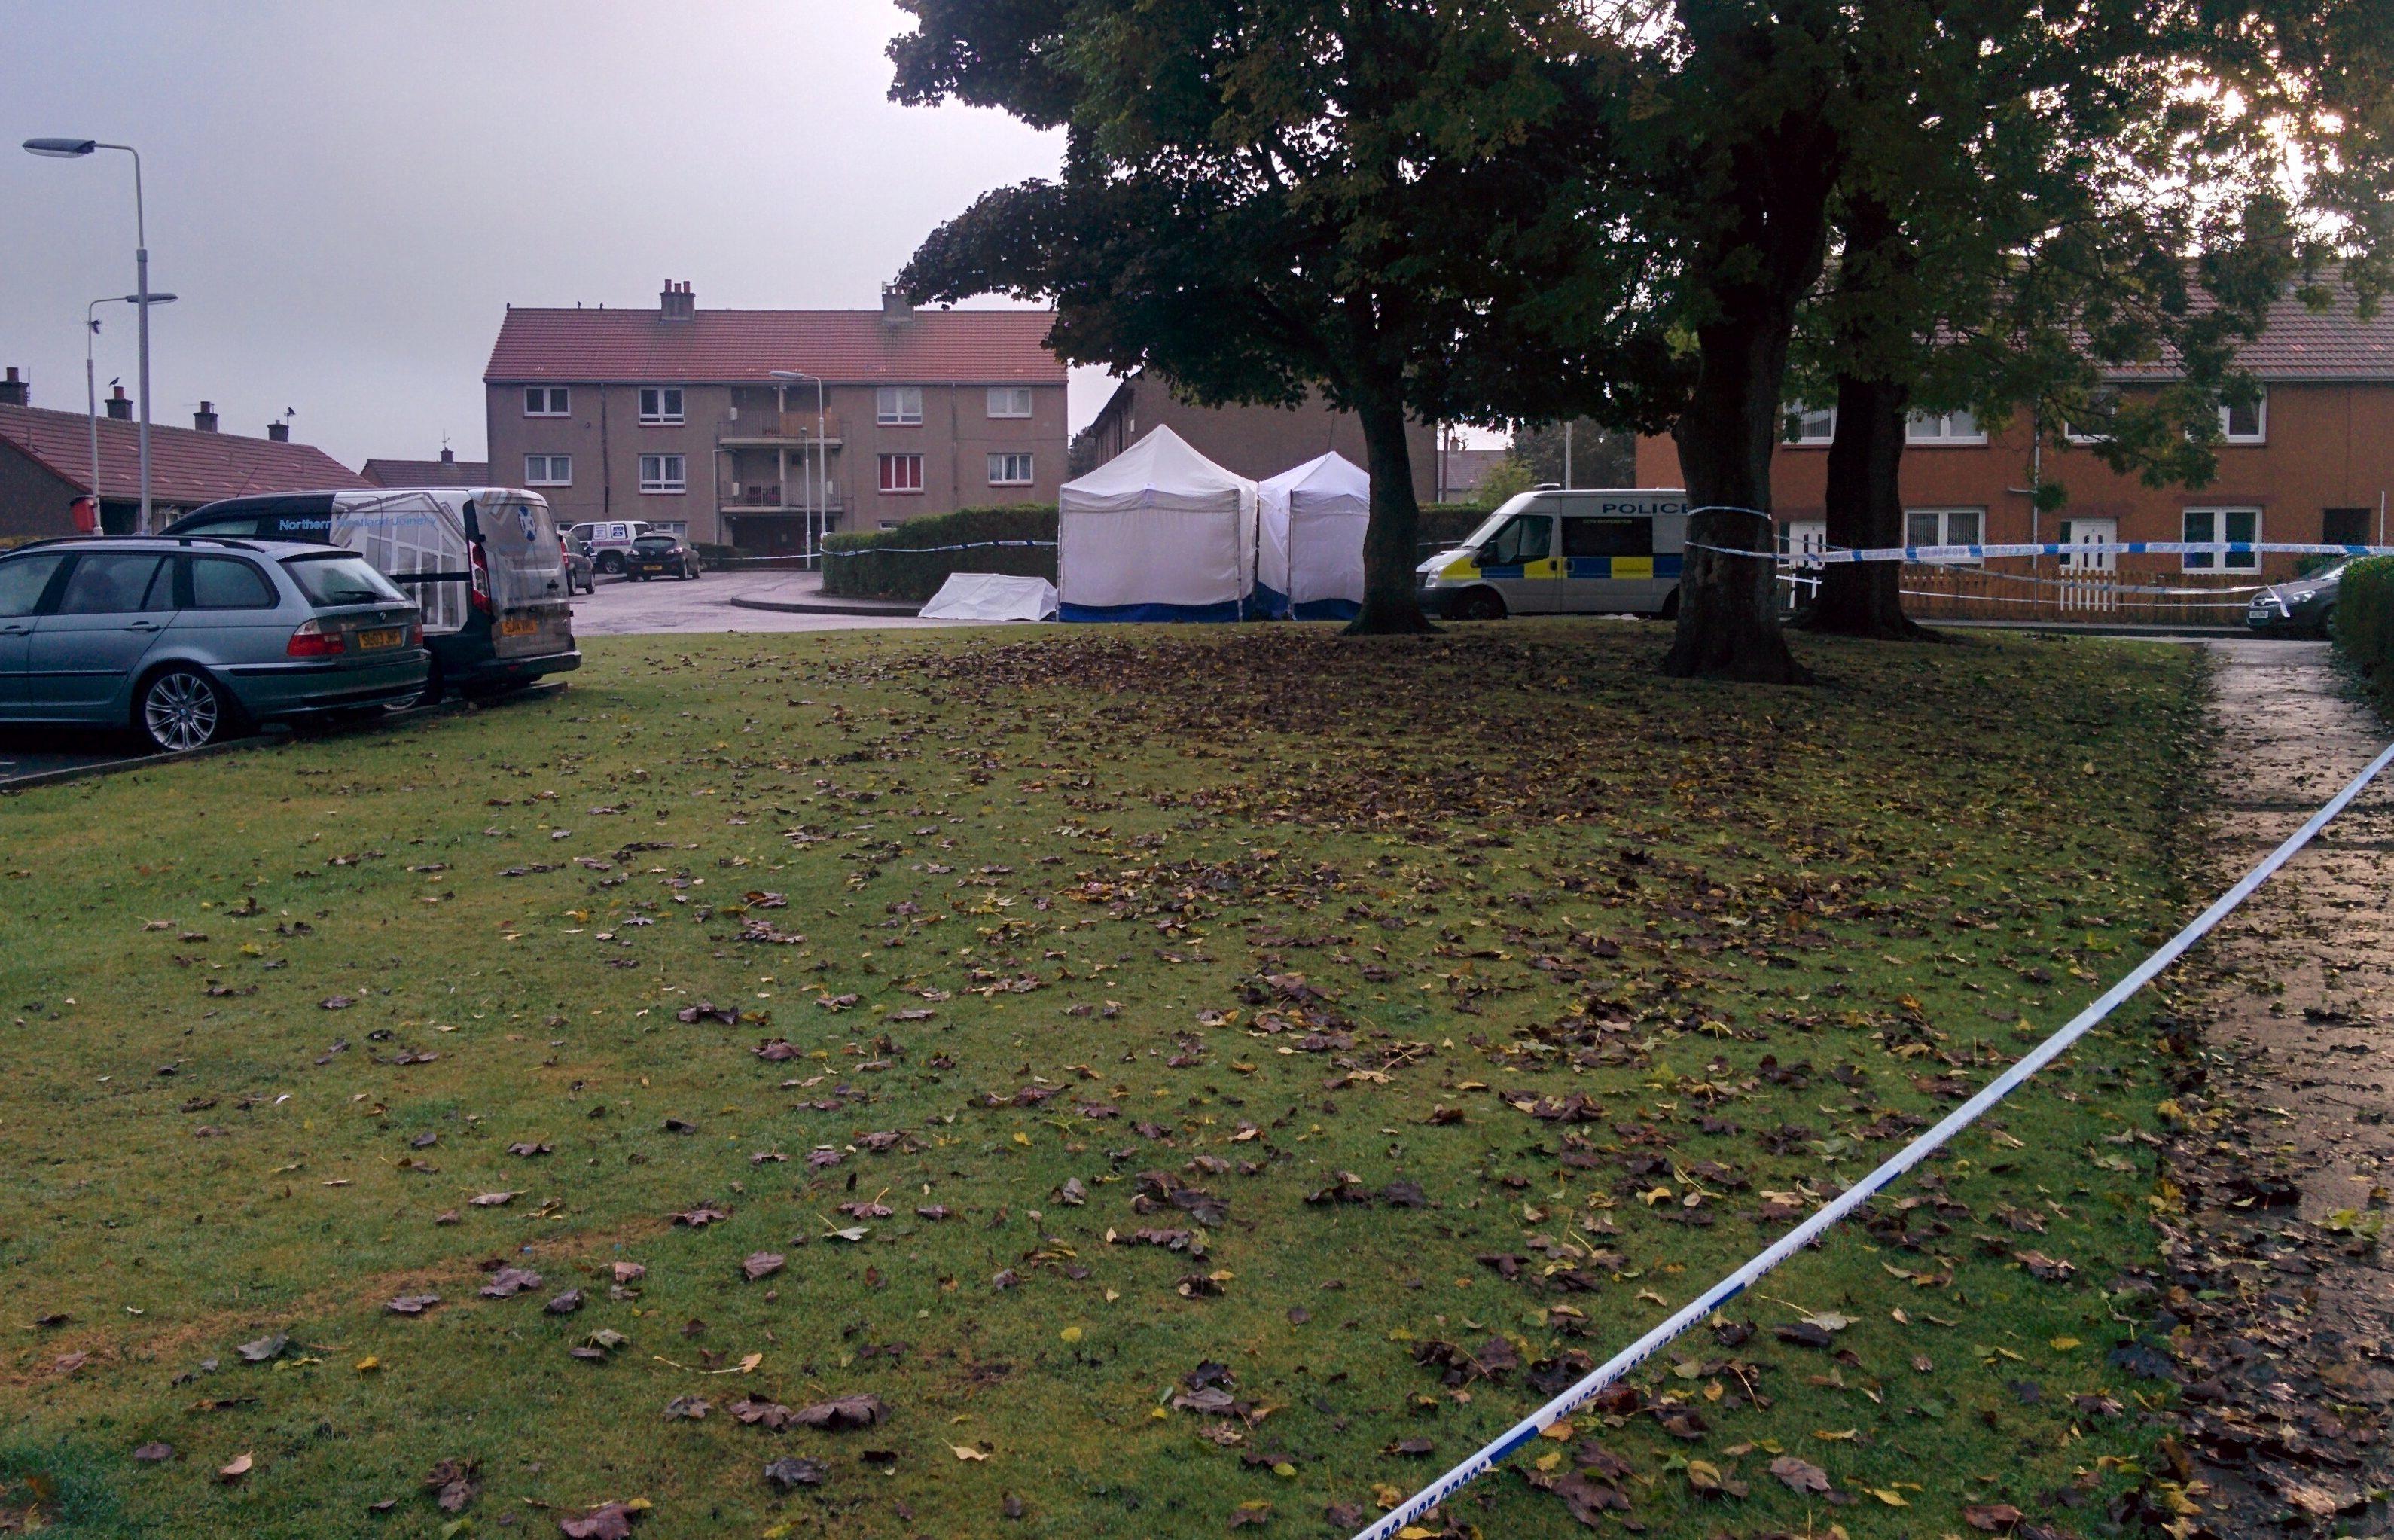 The scene in Farne Court on Sunday morning.